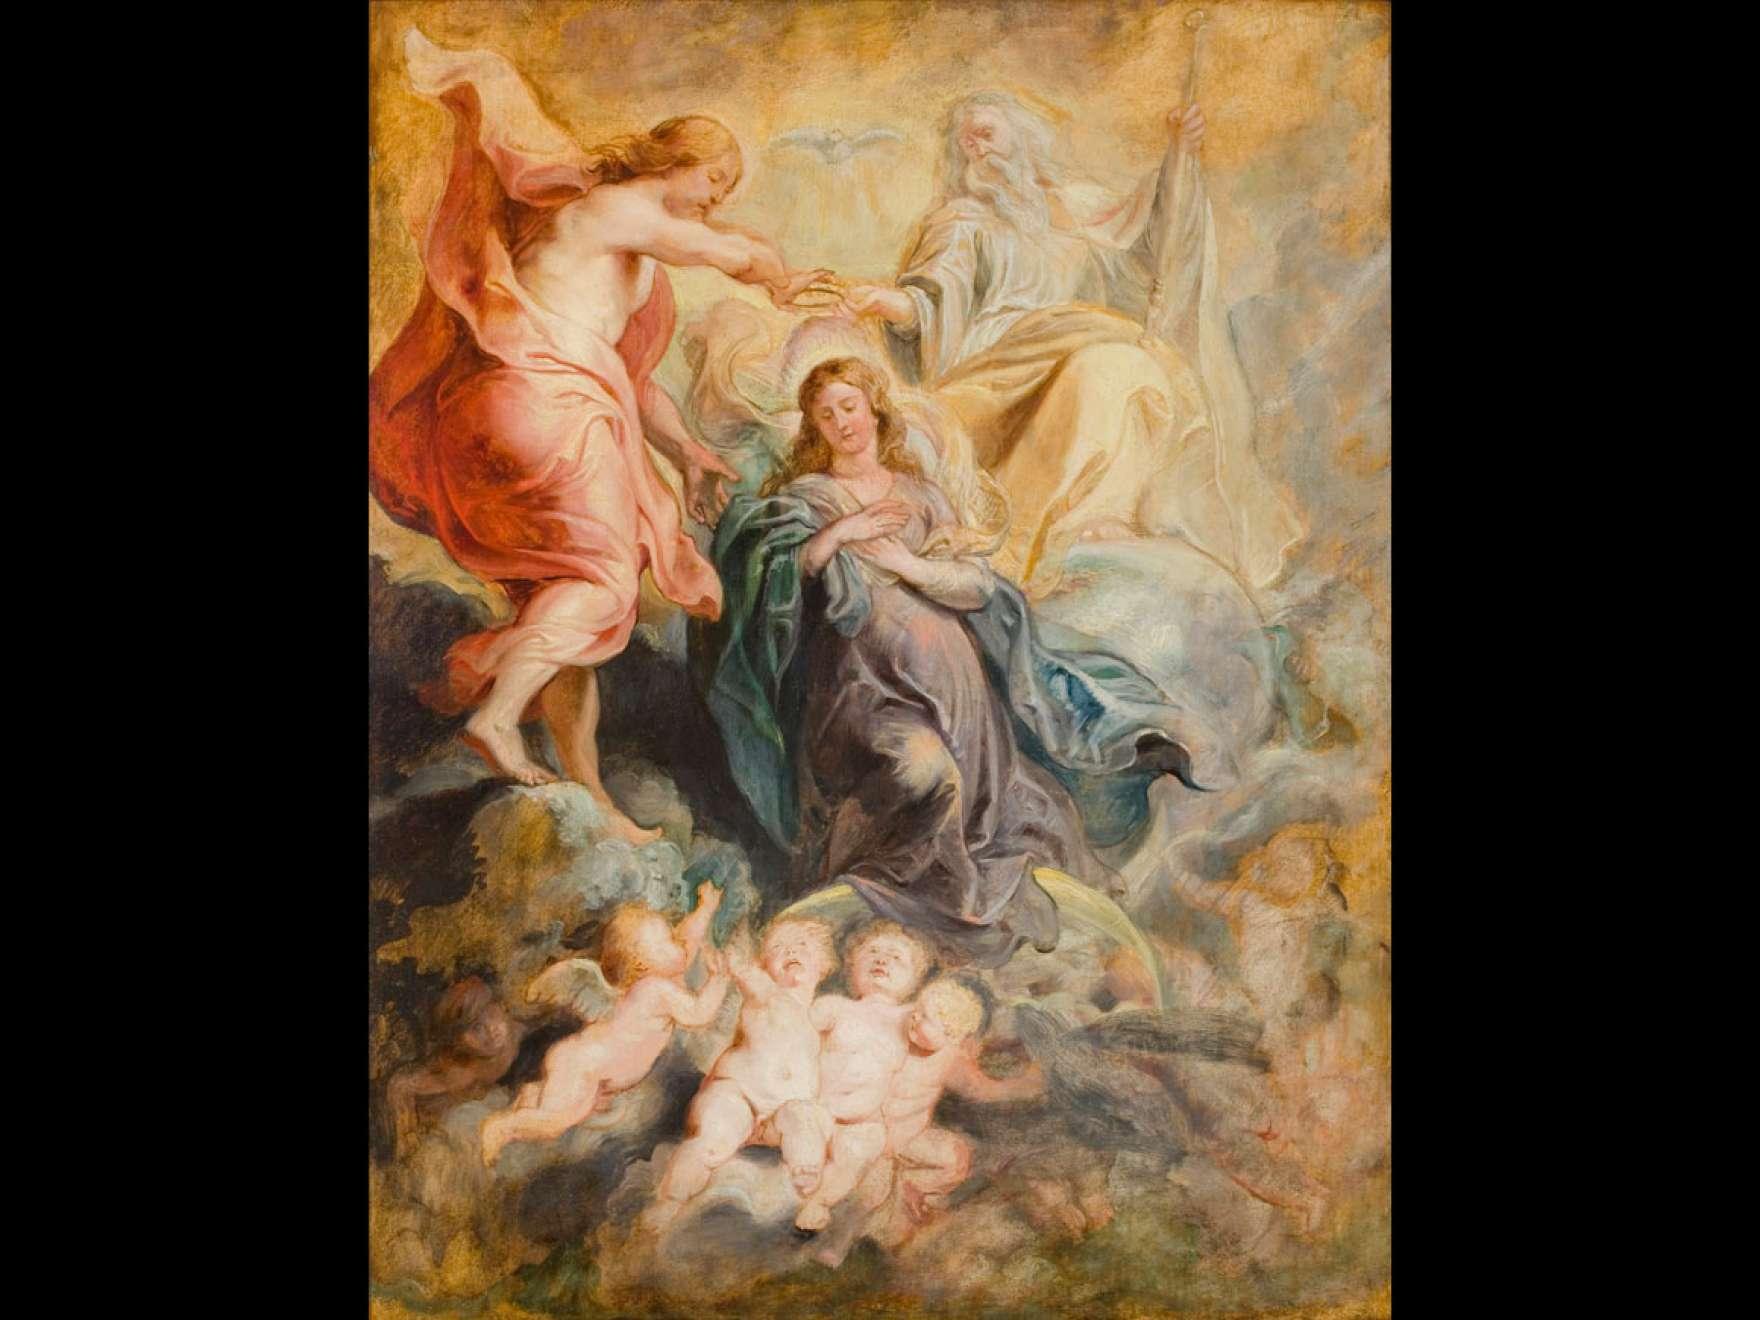 Peter Paul Rubens' painting, Coronation of the Virgin